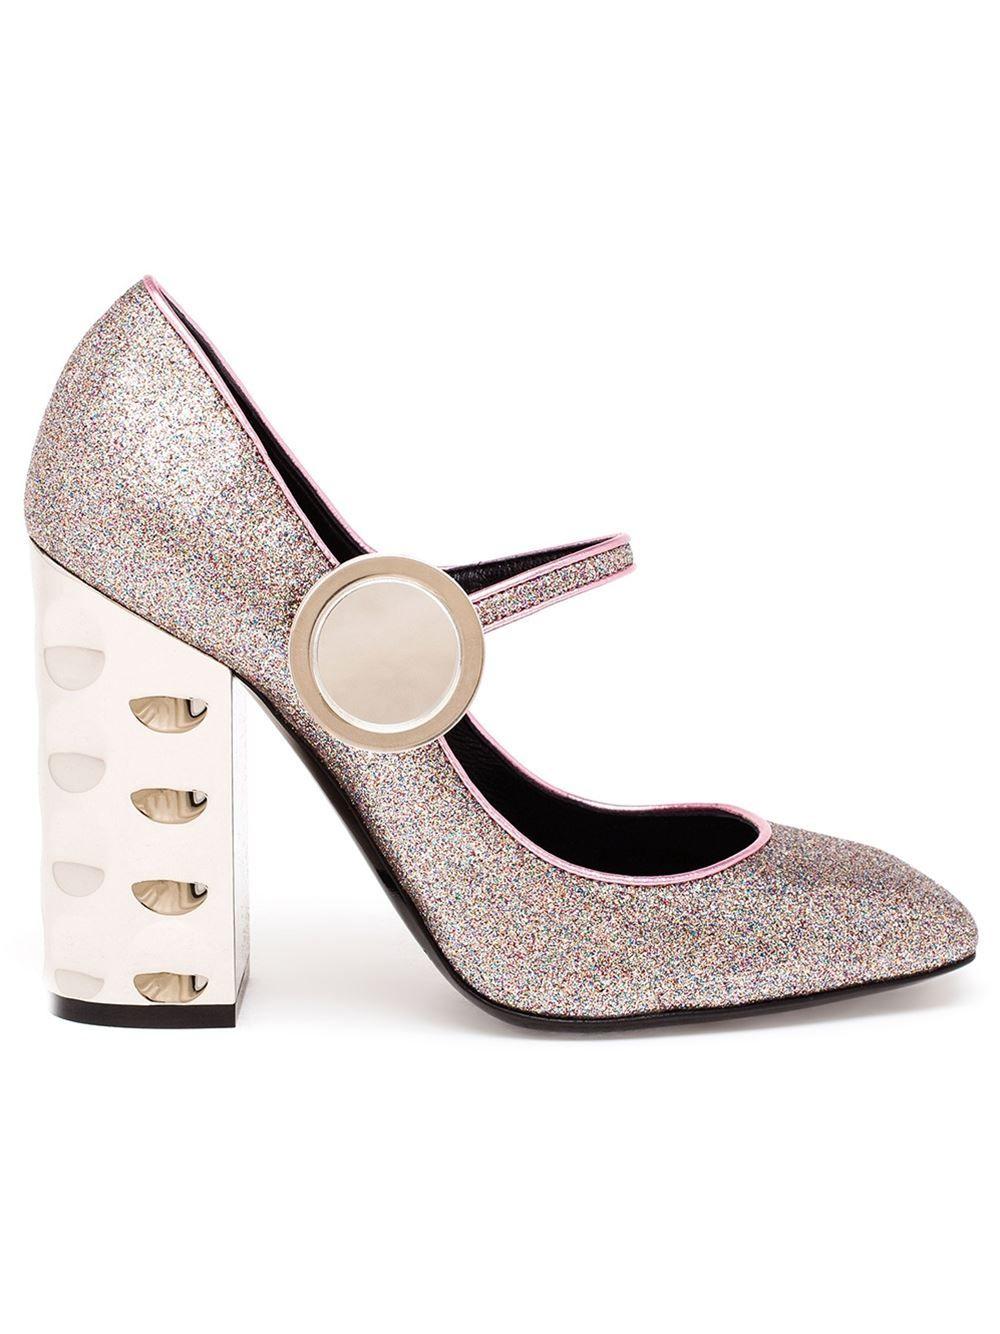 factory outlet Nicholas Kirkwood Glitter Mary Jane Pumps buy cheap prices 2014 unisex fake sale online 0J7Y8z